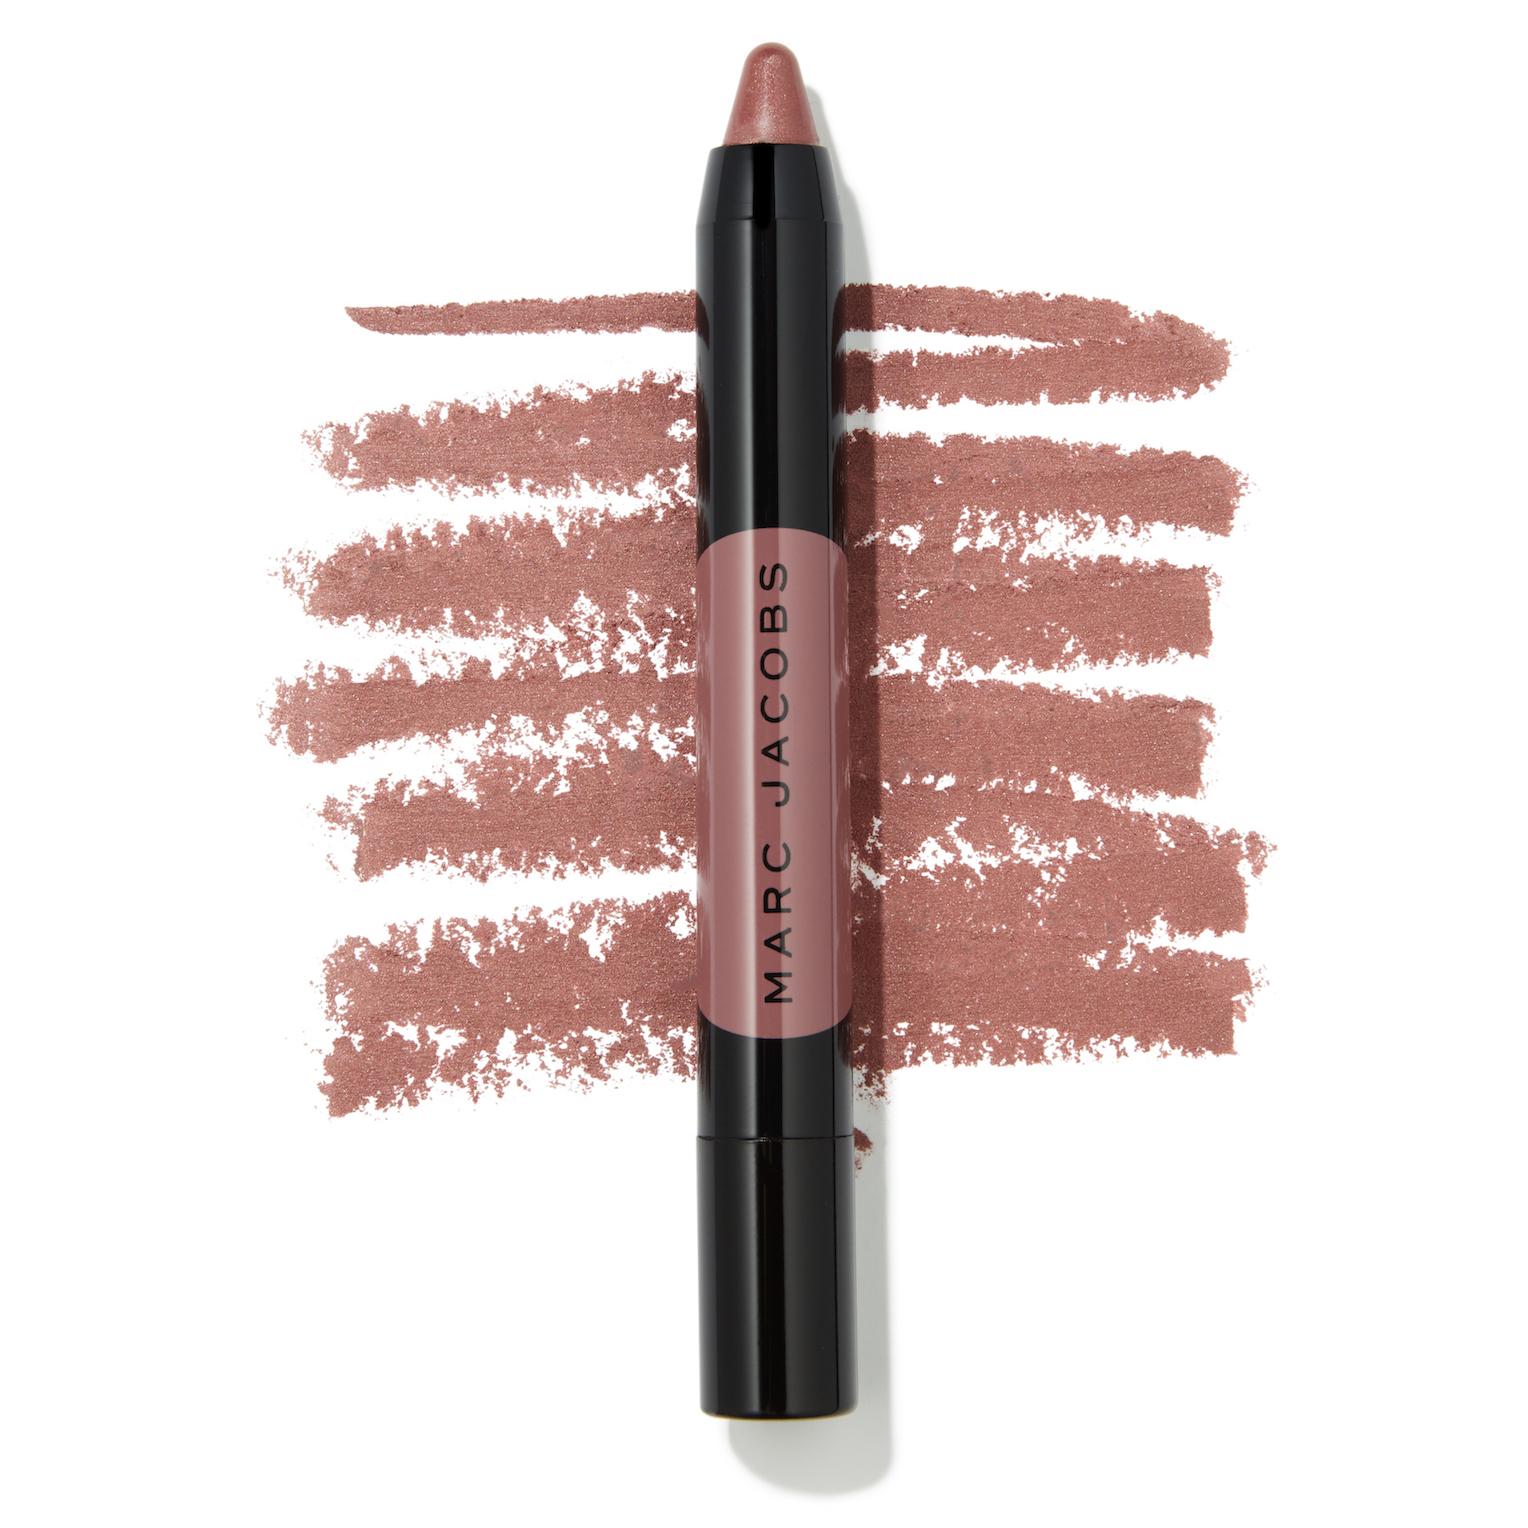 Marc Jacobs Beauty Le Marc Liquid Lip Crayon - Send Nudes Swatch - AED 125